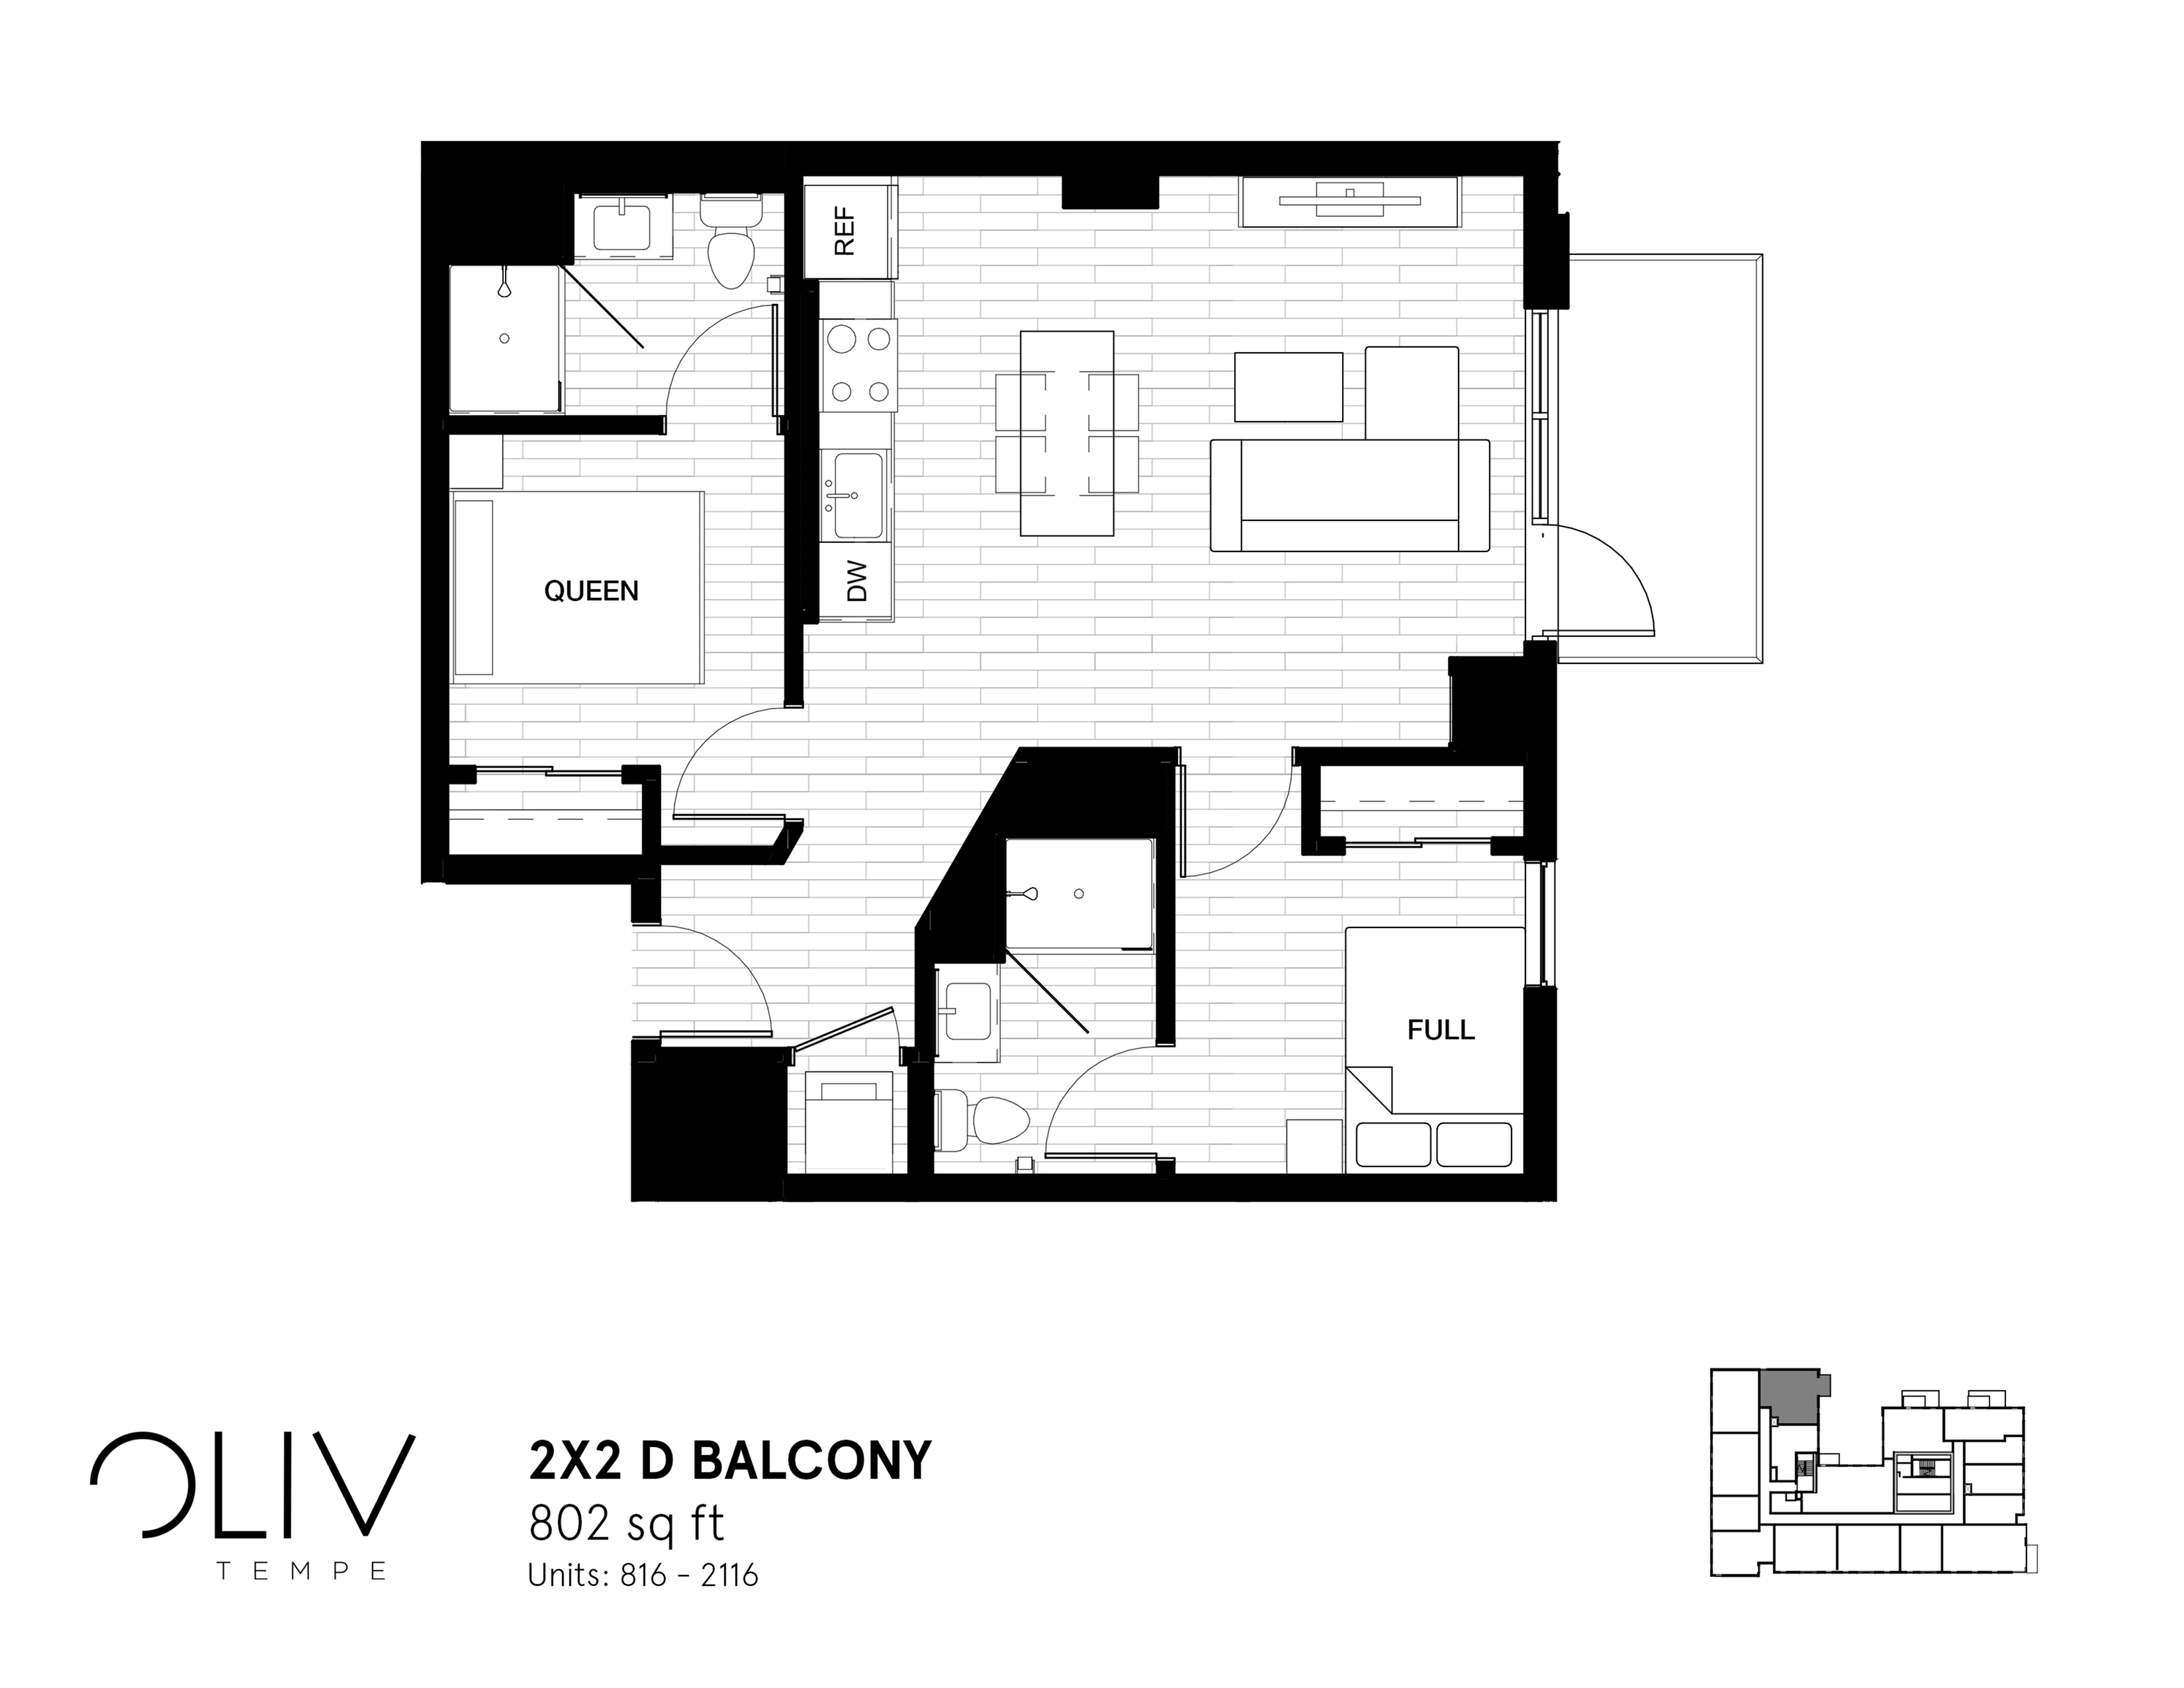 2x2 D Balcony